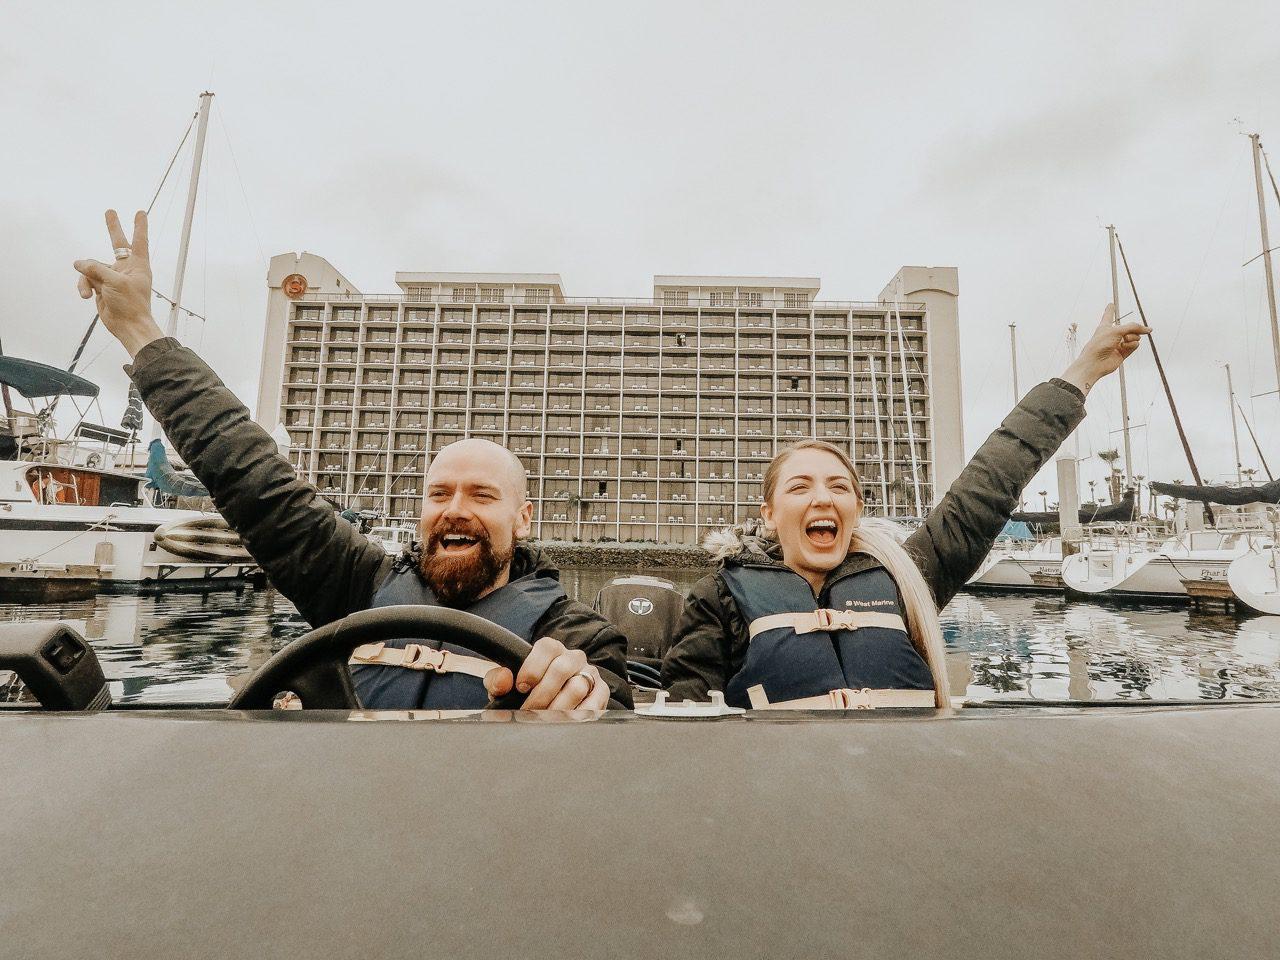 Speed Boat Adventures Tours, San Diego ©Little Grey Box